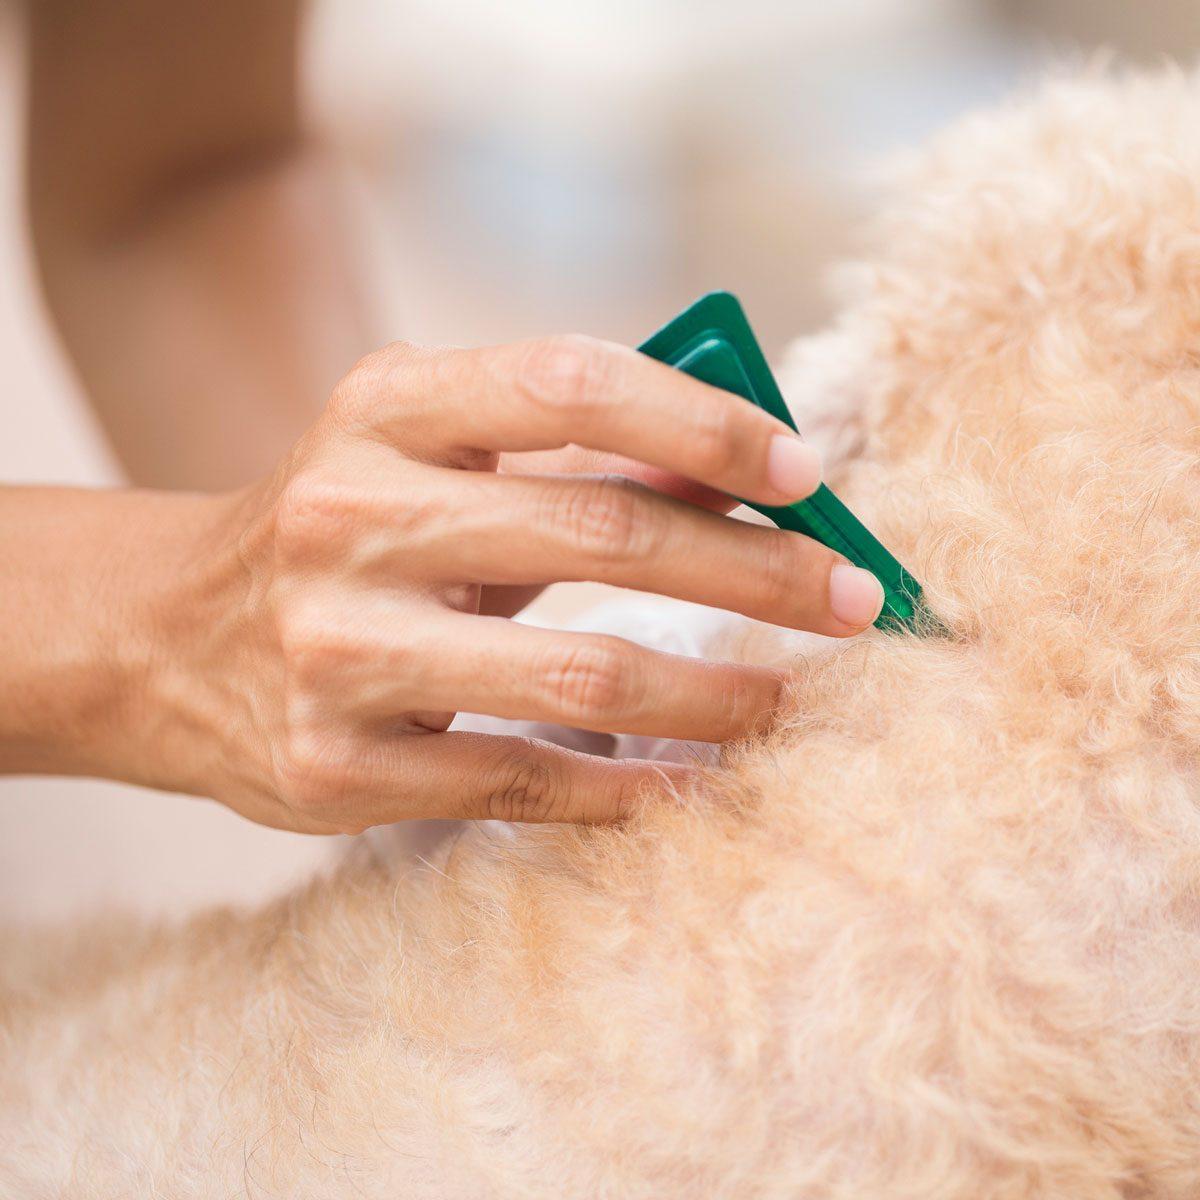 Woman applying flea treatment to dog